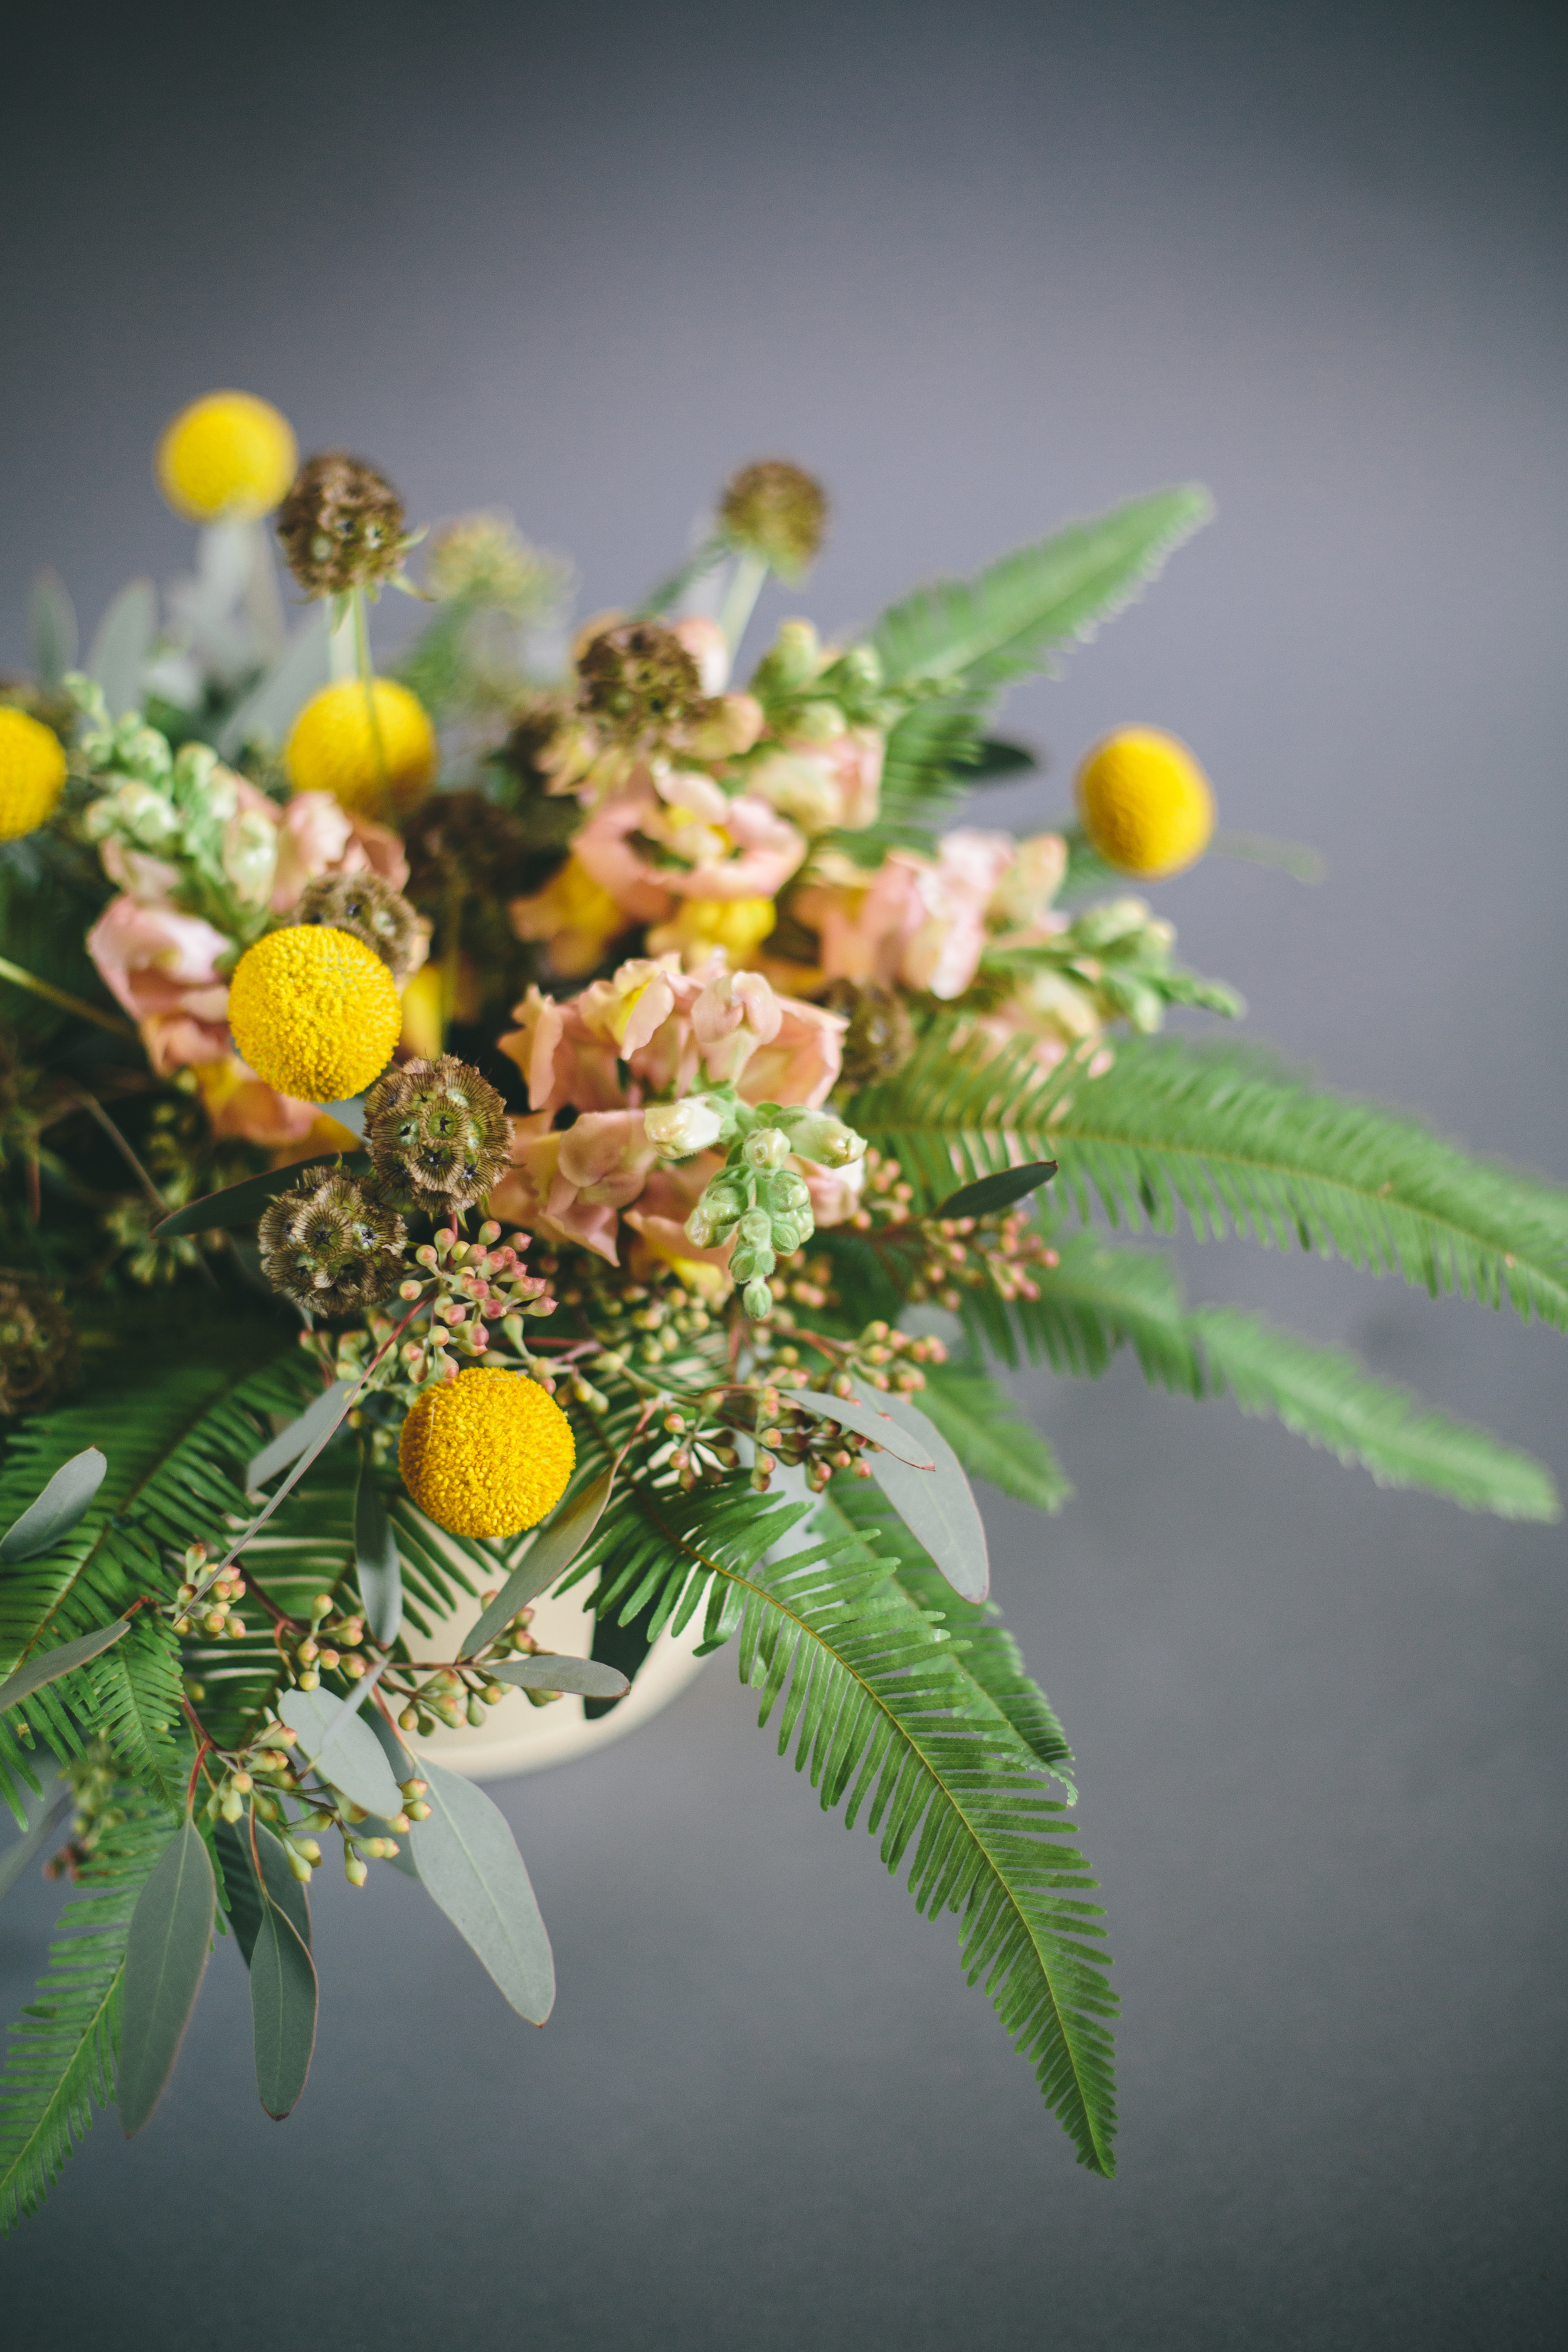 pretty_flowers-7830.jpg